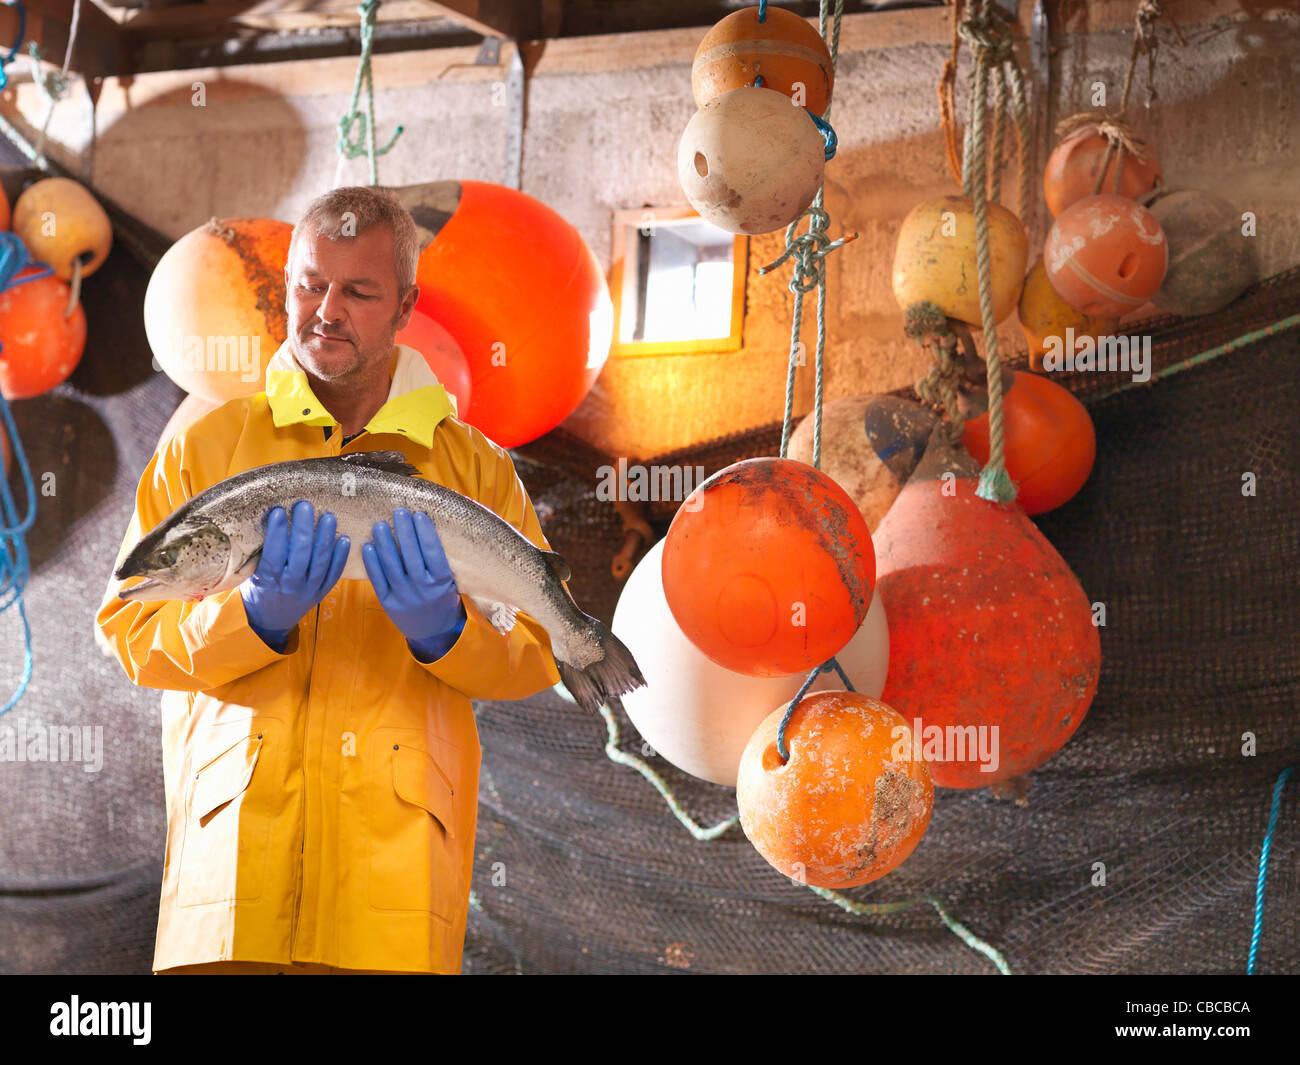 Fisherman holding salmon on boat - Stock Image